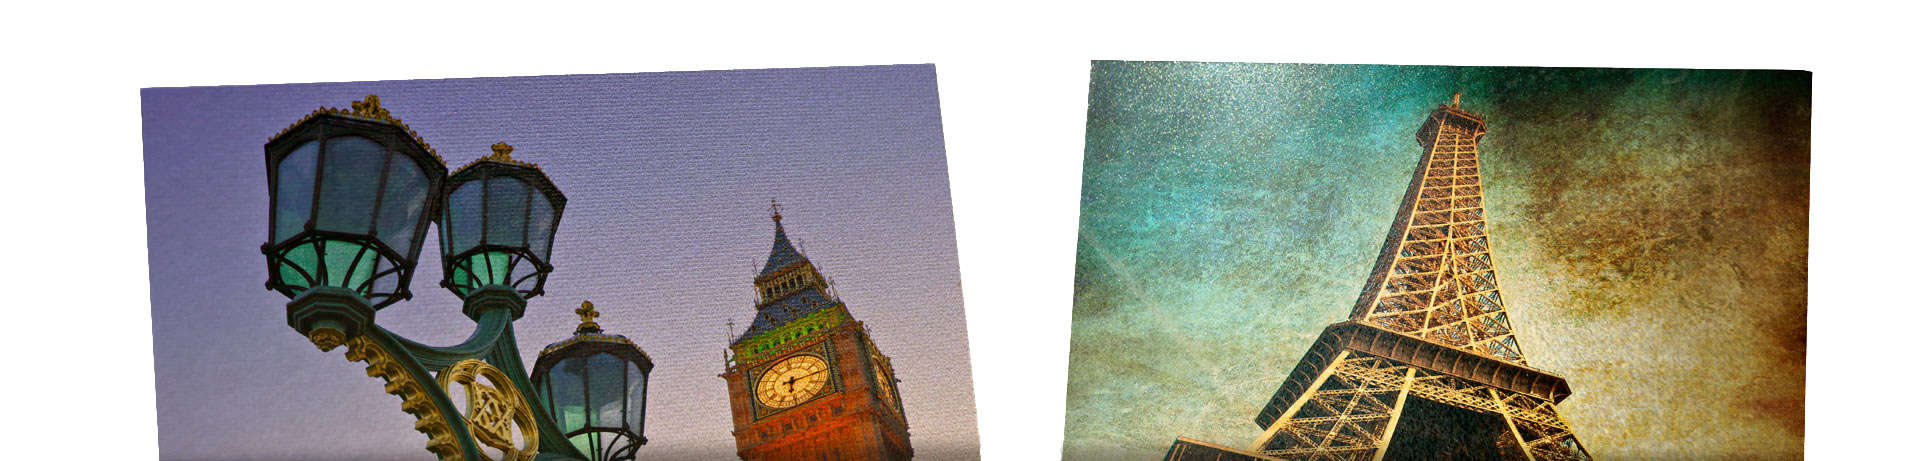 metallic photo prints and canvas photo prints closeup finish details